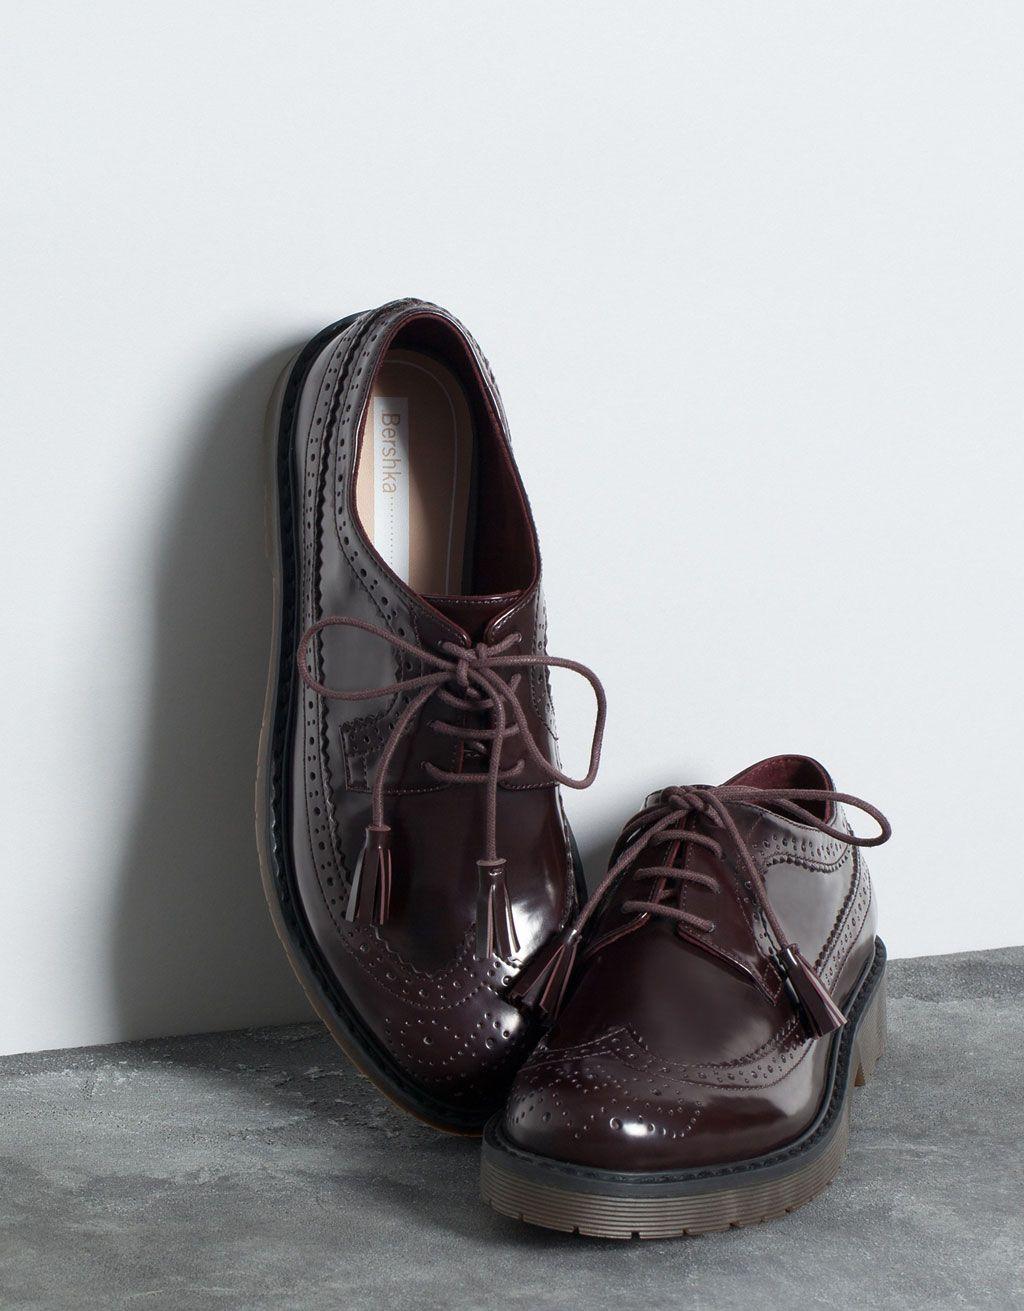 Eu usaria numa boa mesmo sendo masculino   Sapato brogue